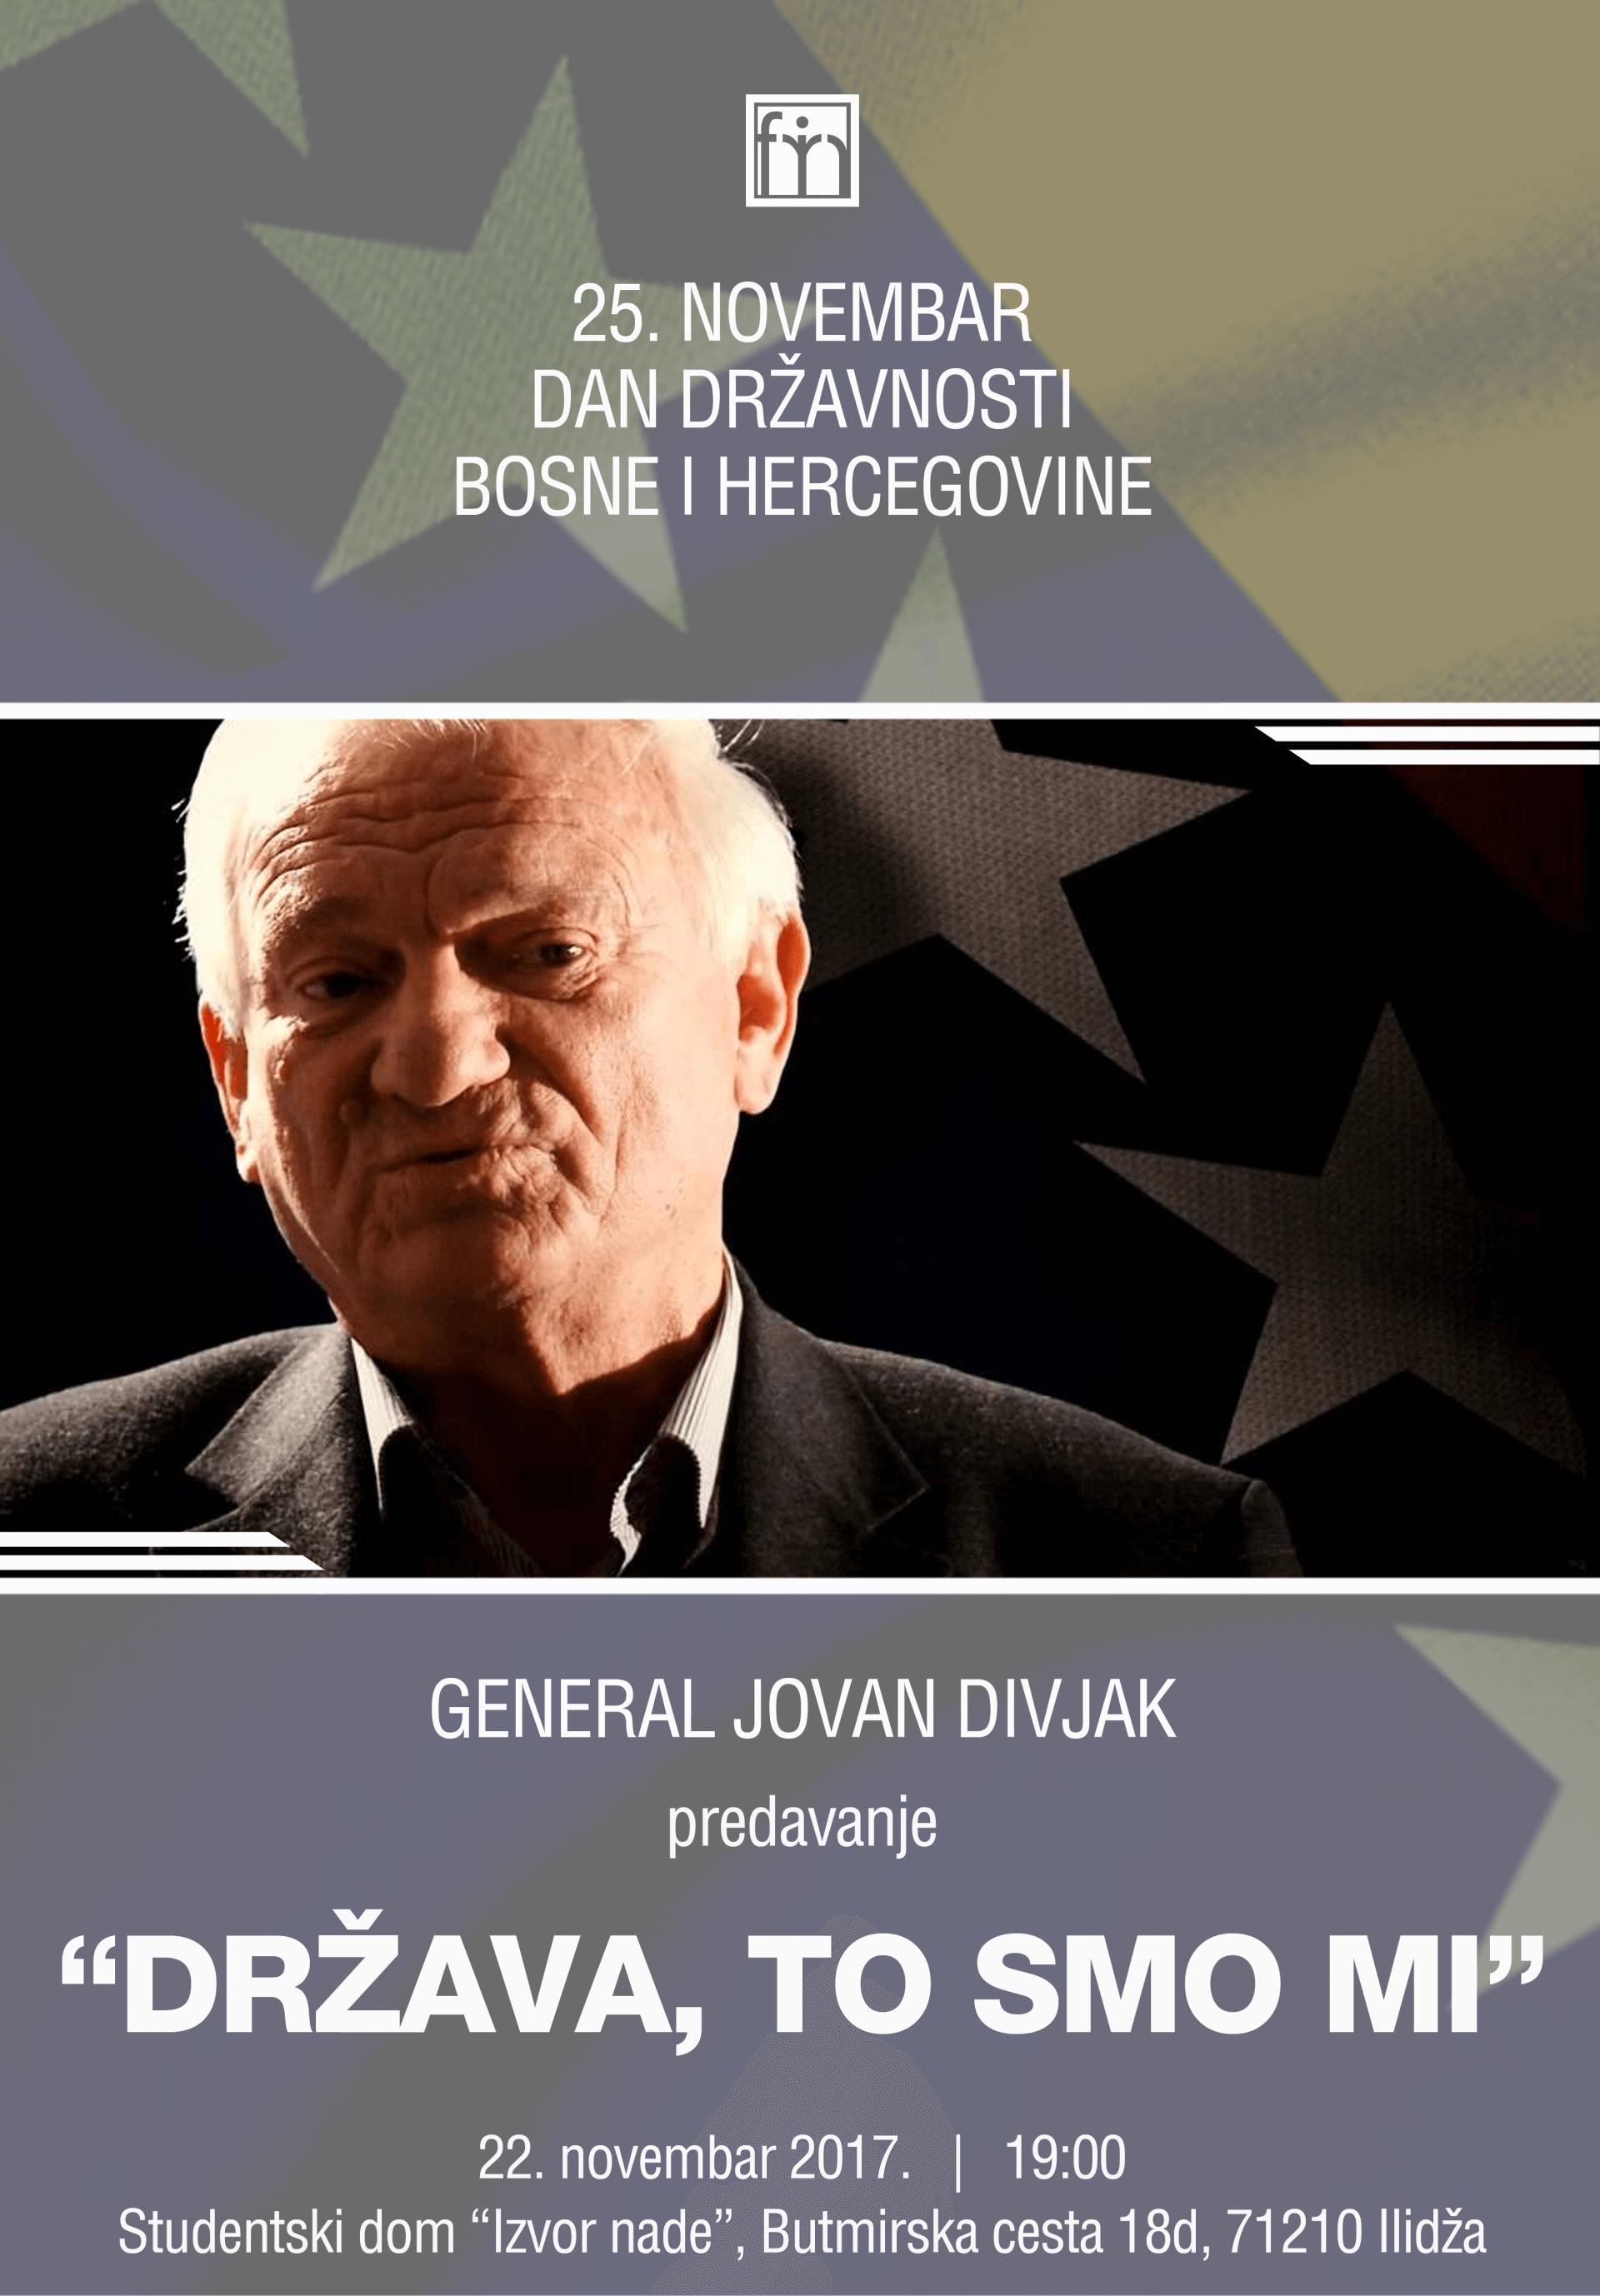 Jovan Divjak plakat 2017 Dan drzavnosti BiH web